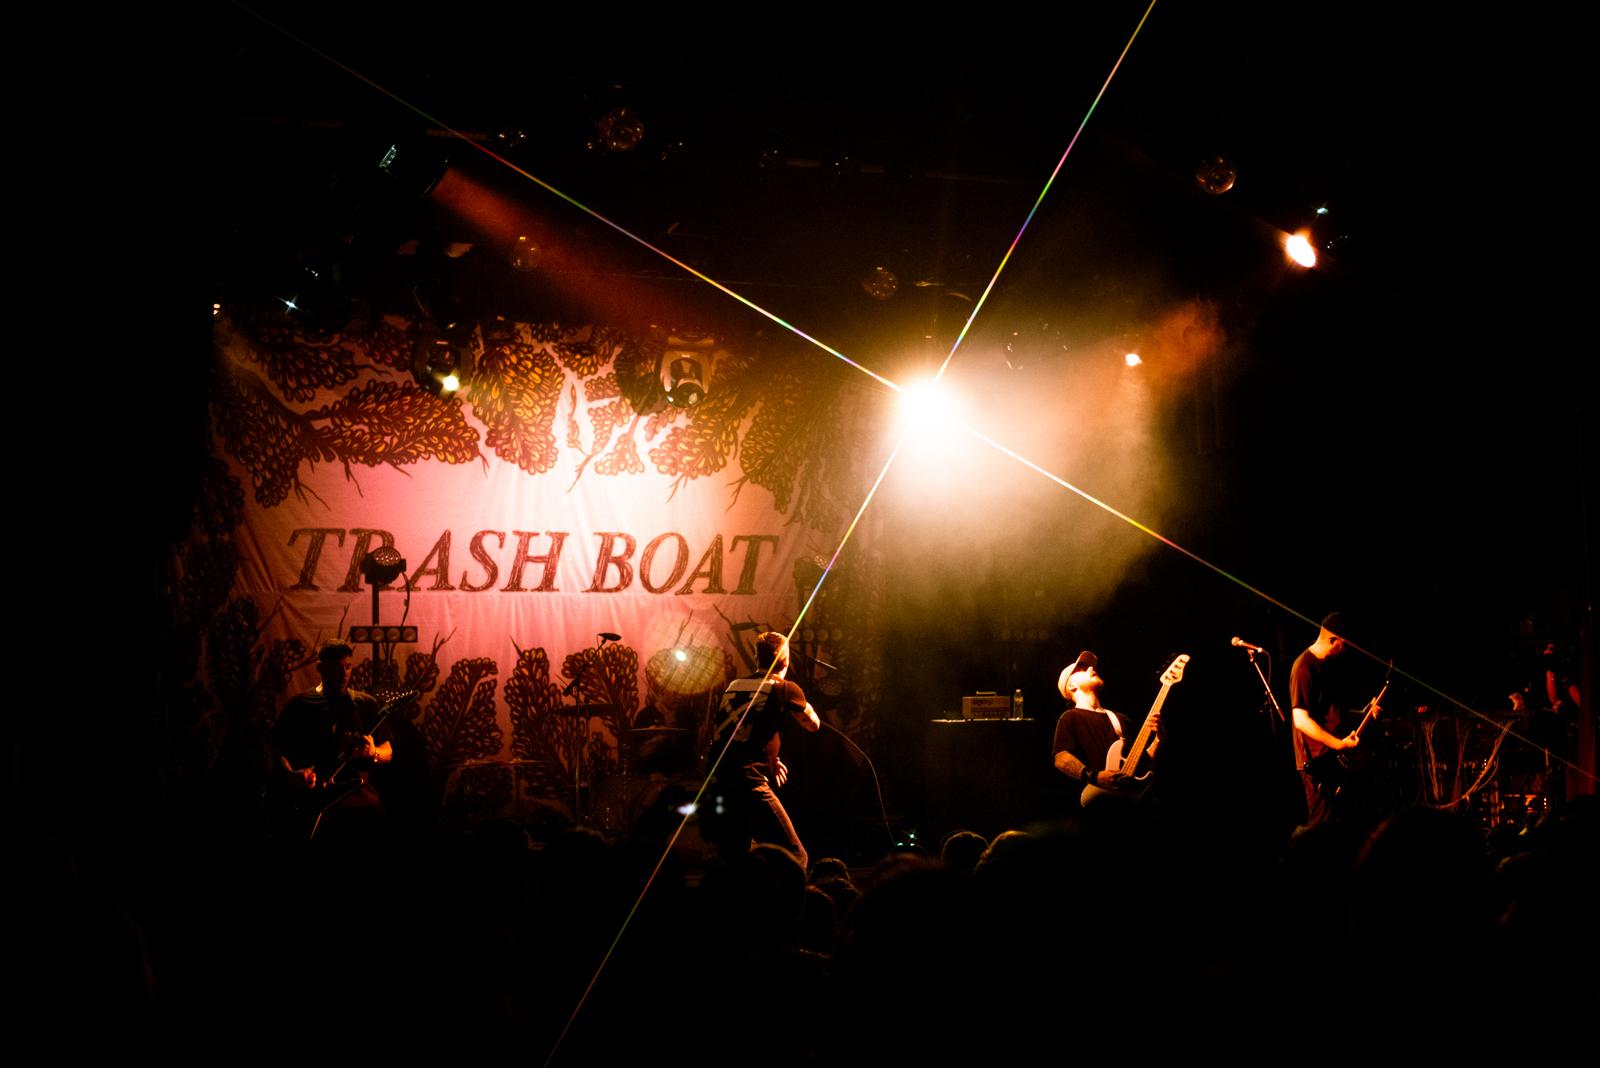 trashboat4.jpg